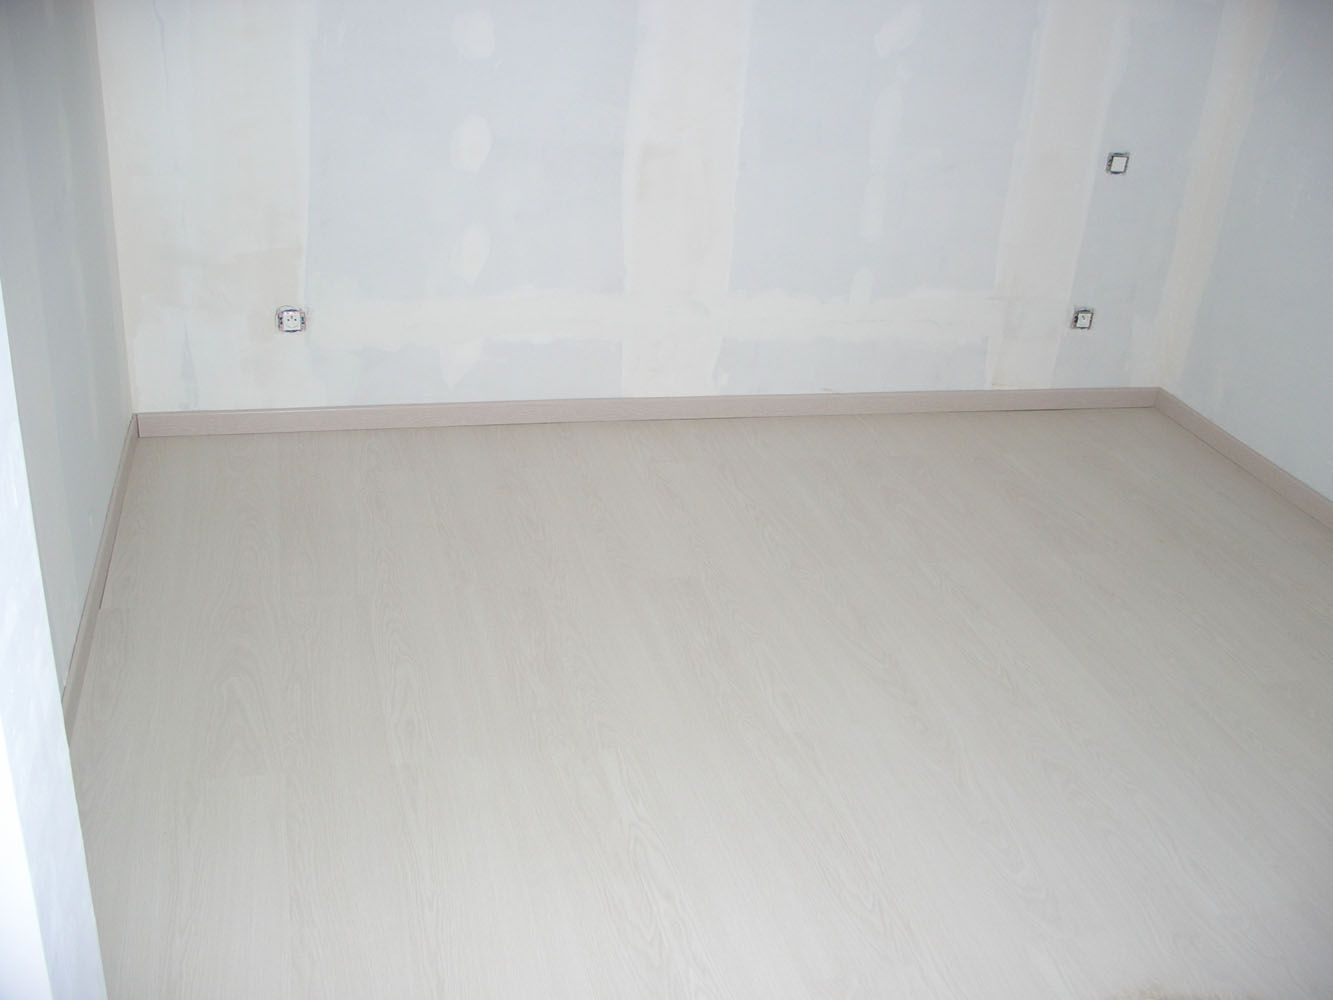 sol stratifi effet parquet ch ne blanc waveless exquisit. Black Bedroom Furniture Sets. Home Design Ideas